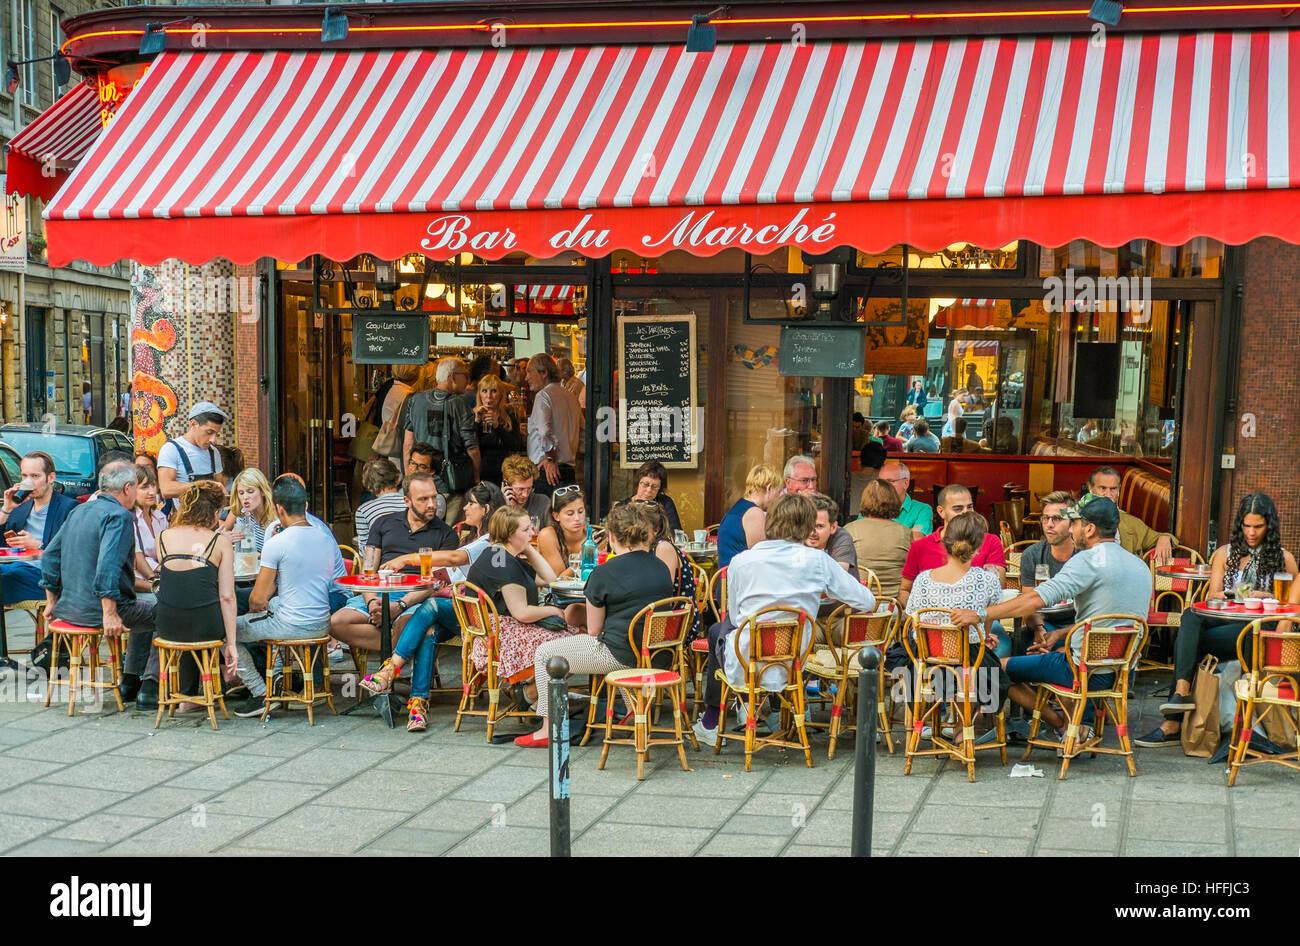 terrace of bar bistrot bar du marché - Stock Image